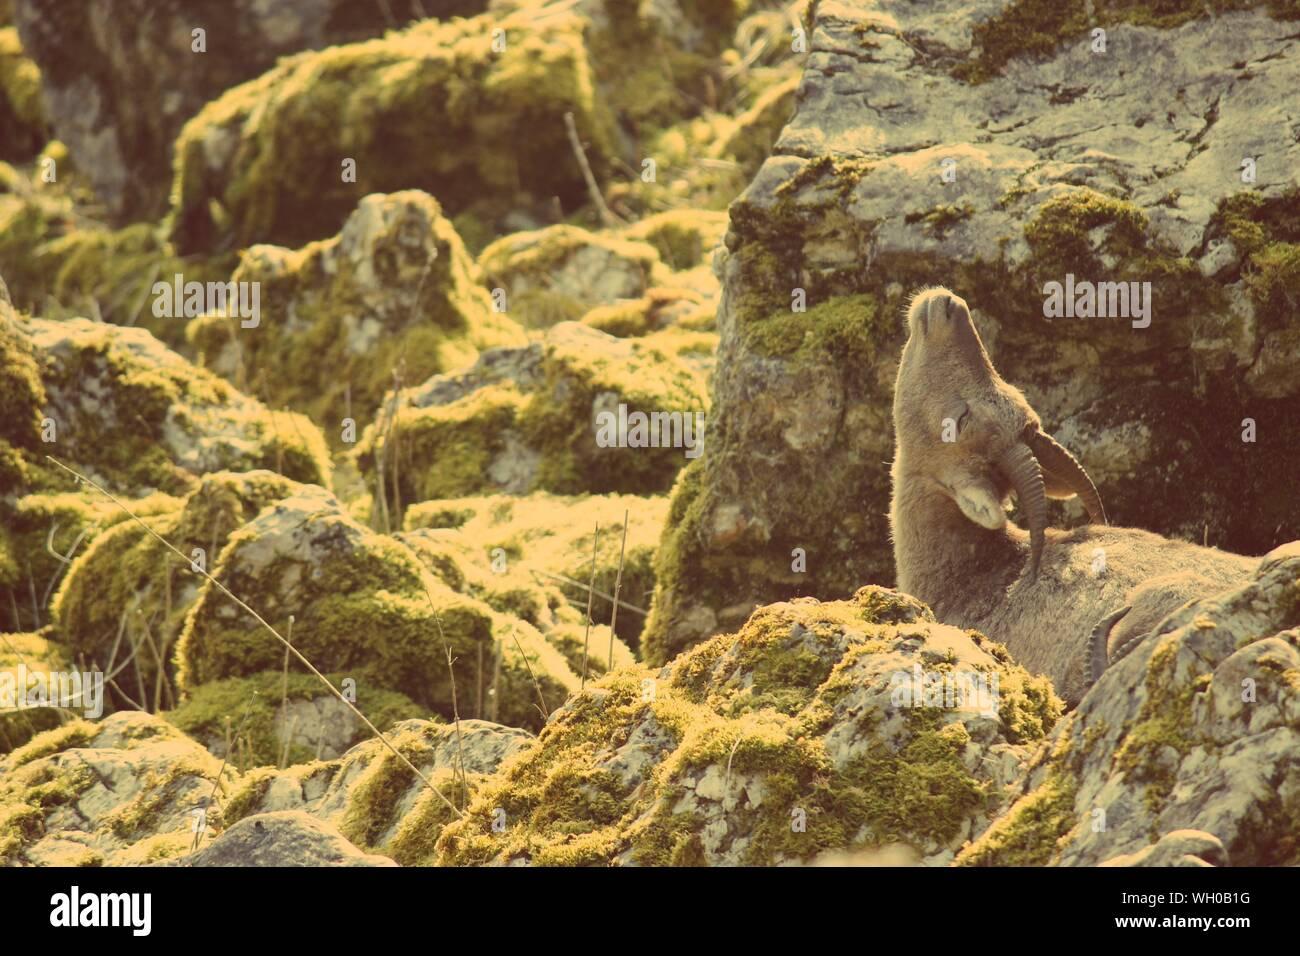 Female Bighorn Sheep Amidst Rocks Stock Photo